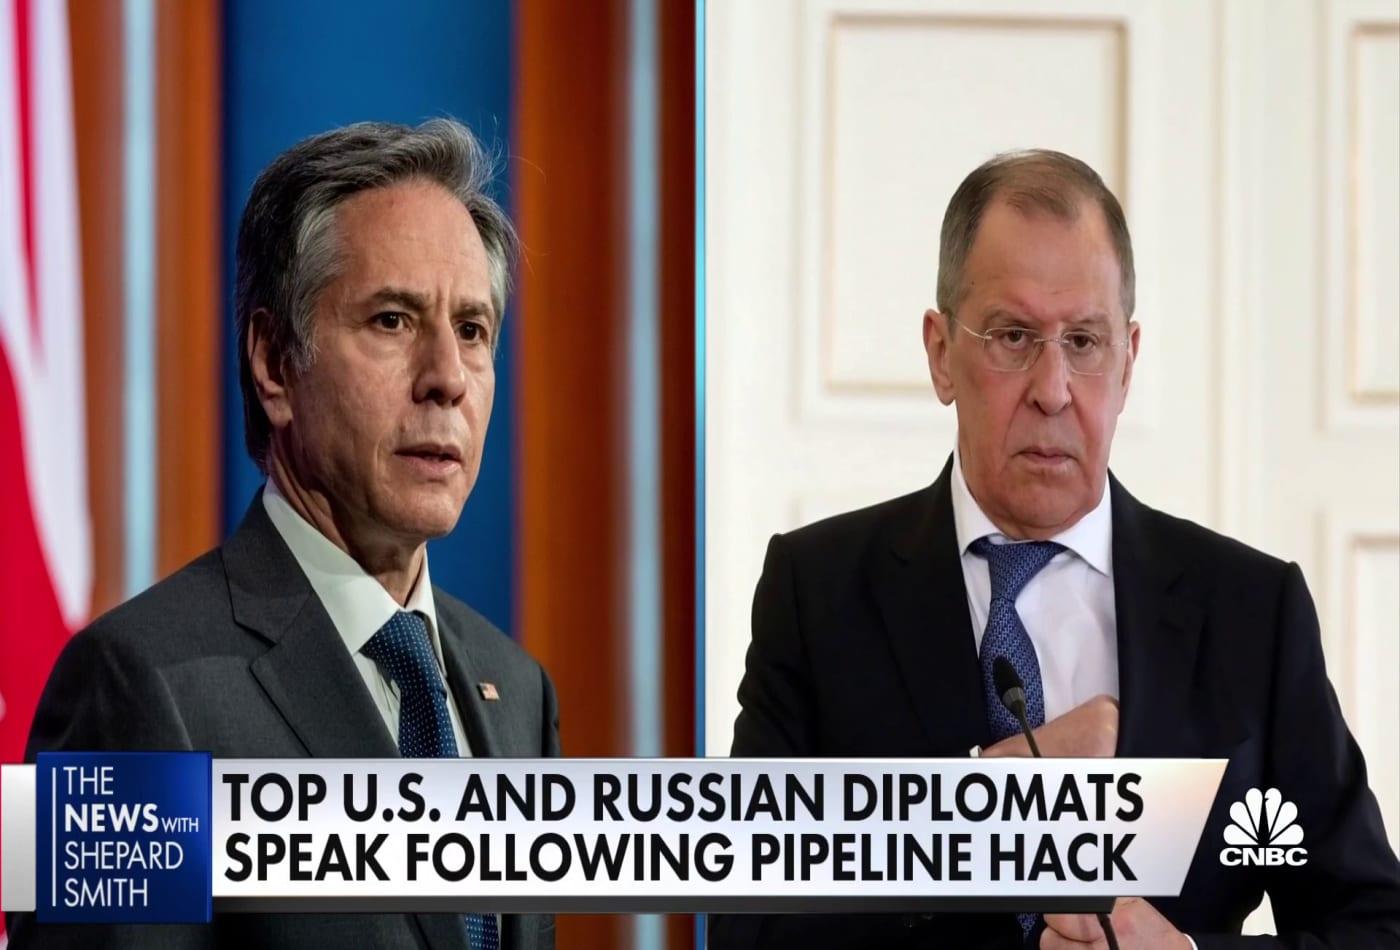 Top U.S. and Russian diplomats speak following pipeline hack